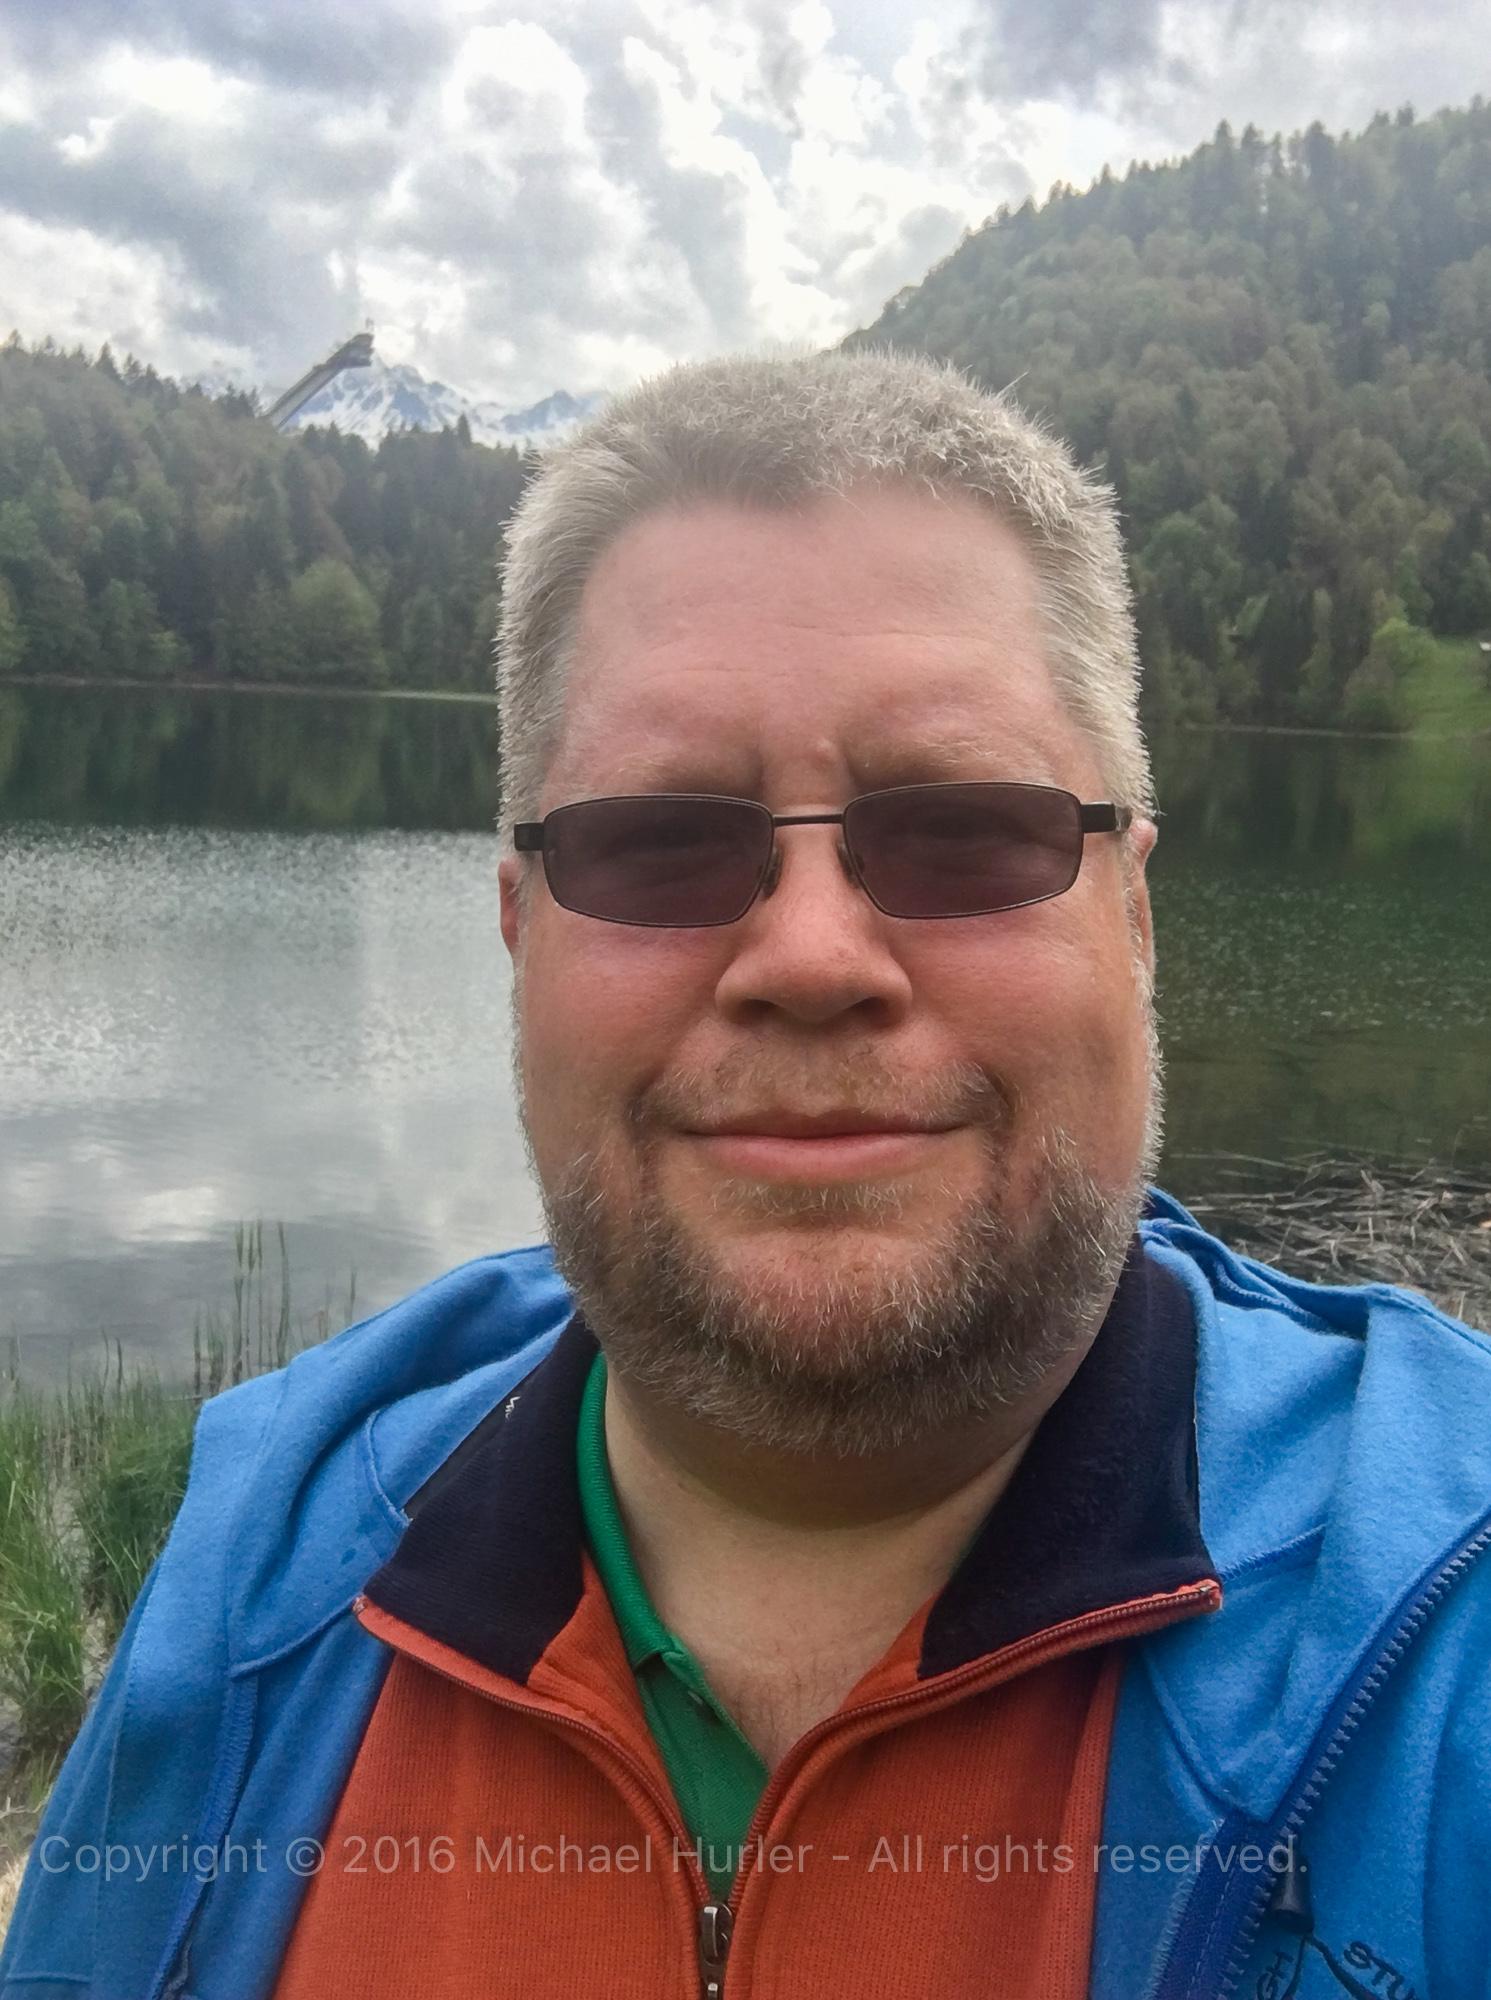 14.05.2016, Oberstdorf Oberstdorf - Freibergsee